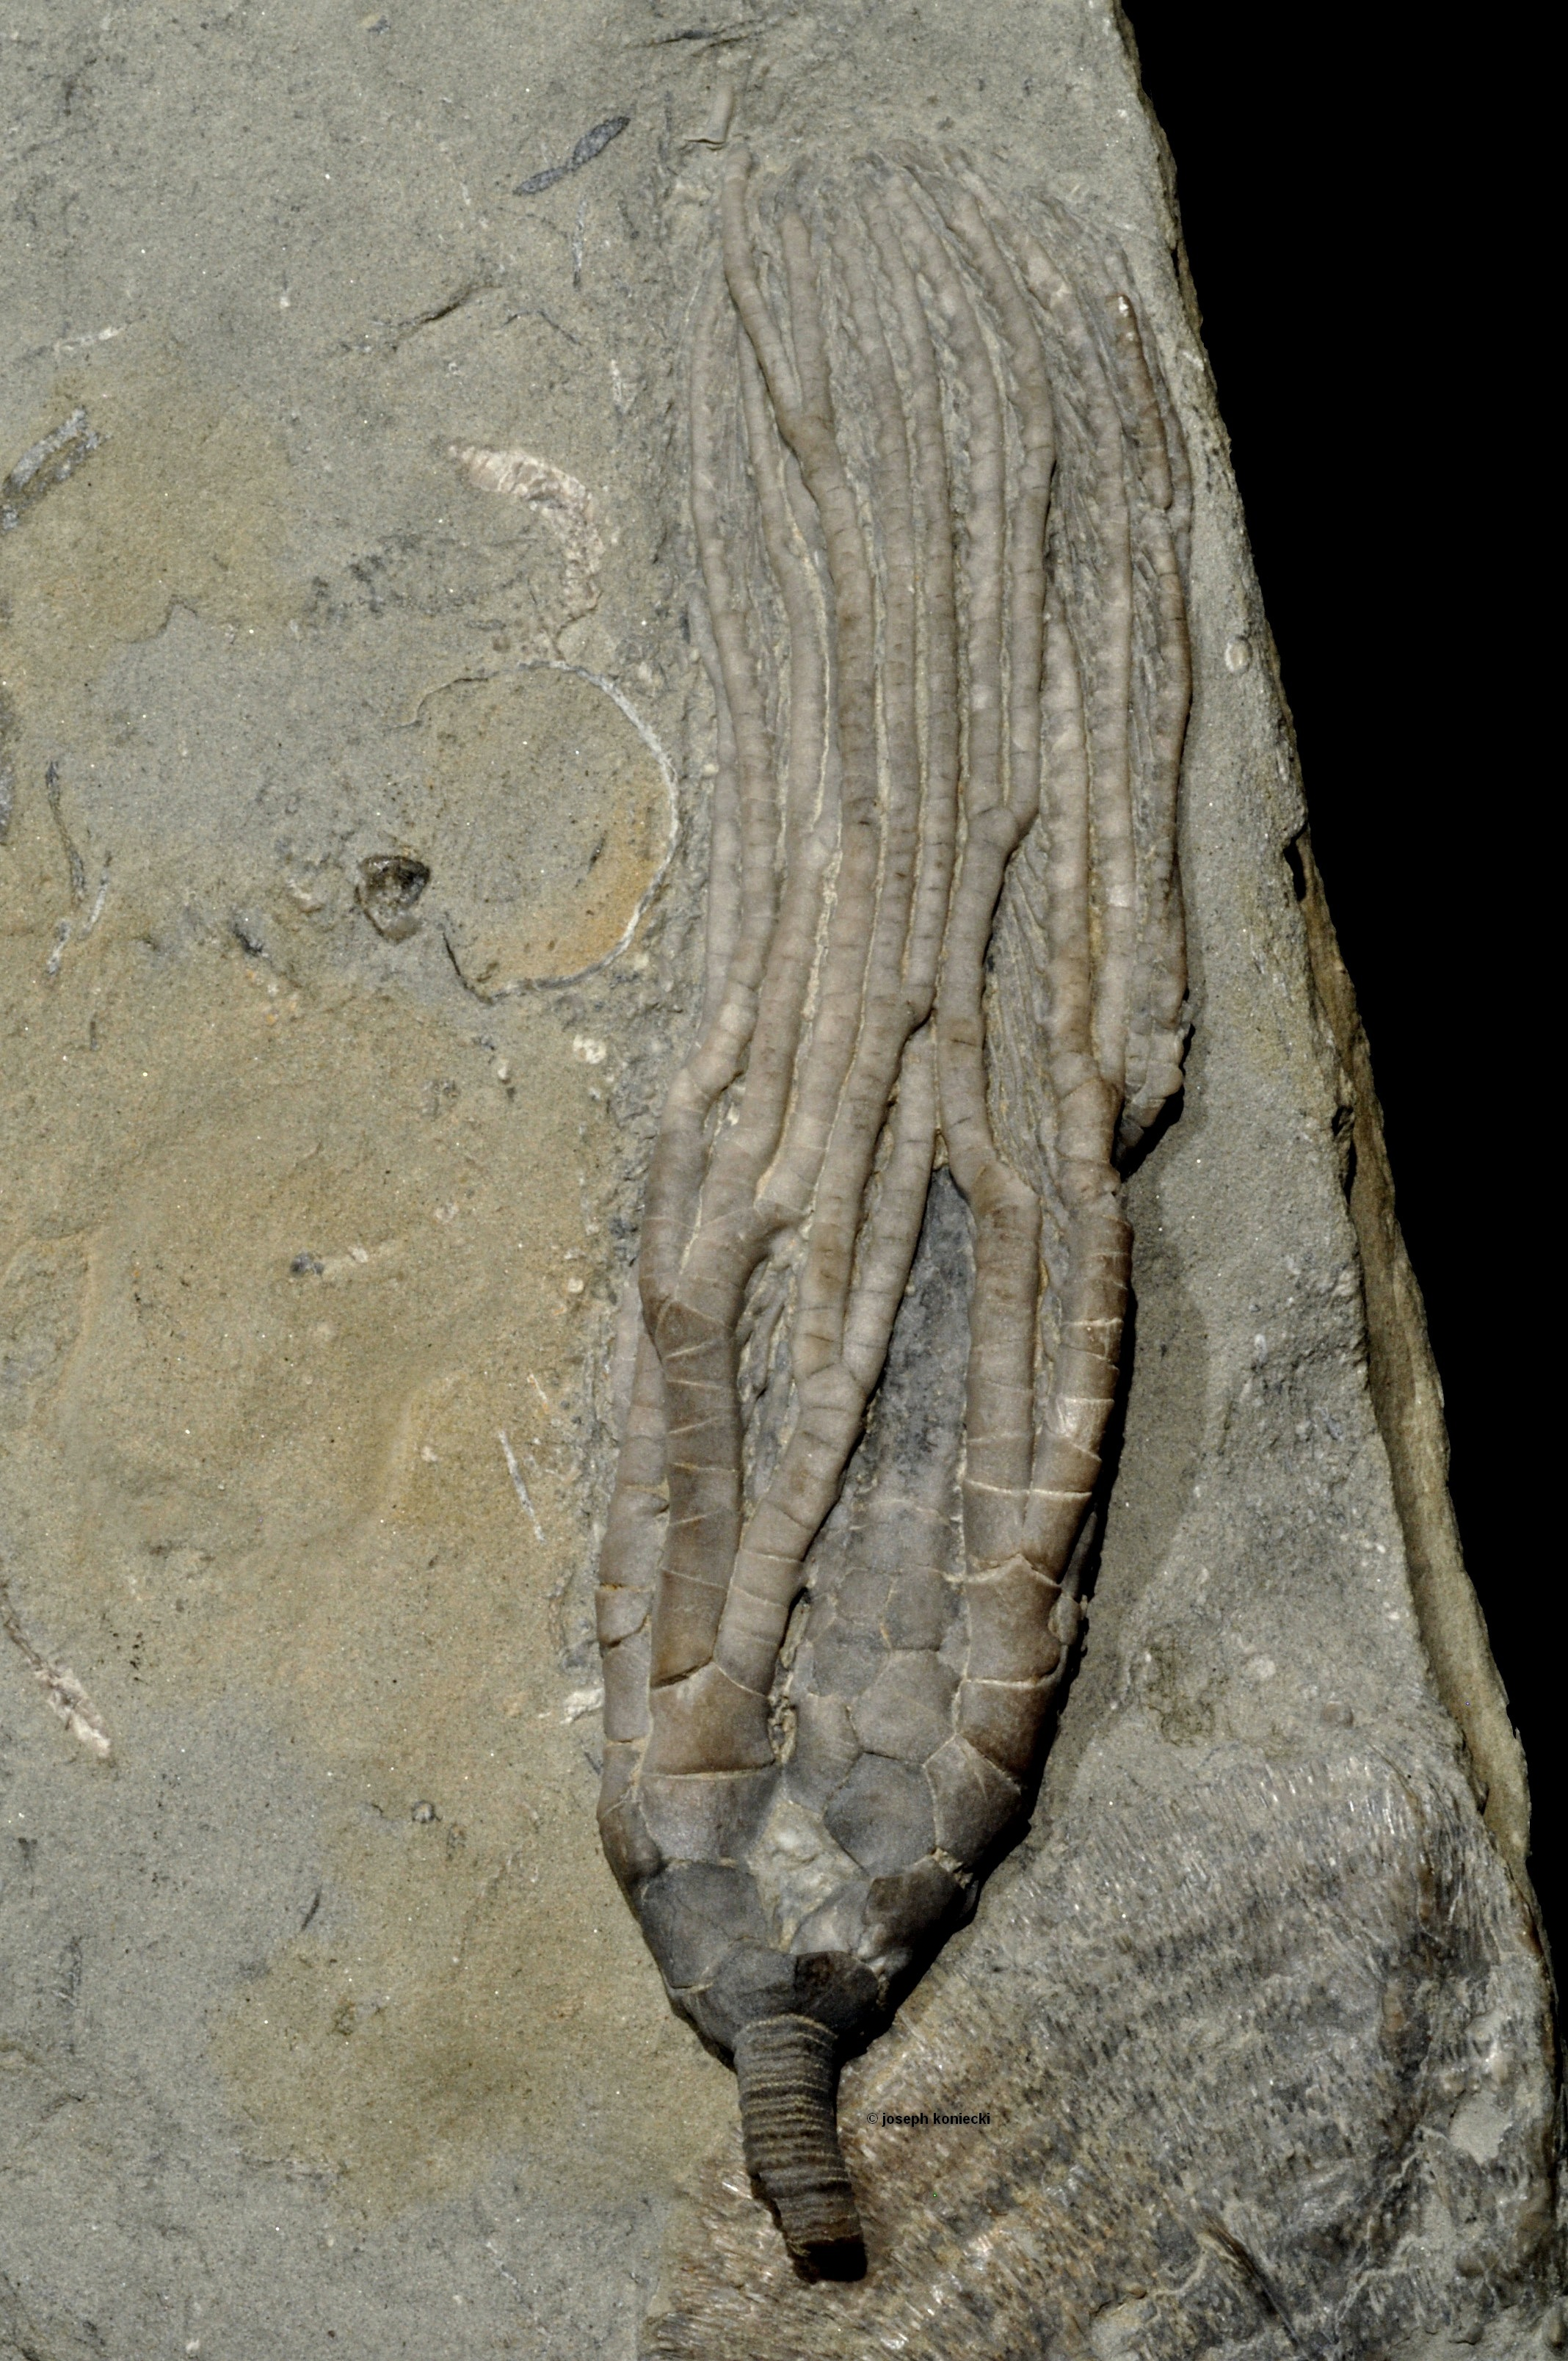 Hypselocrinus